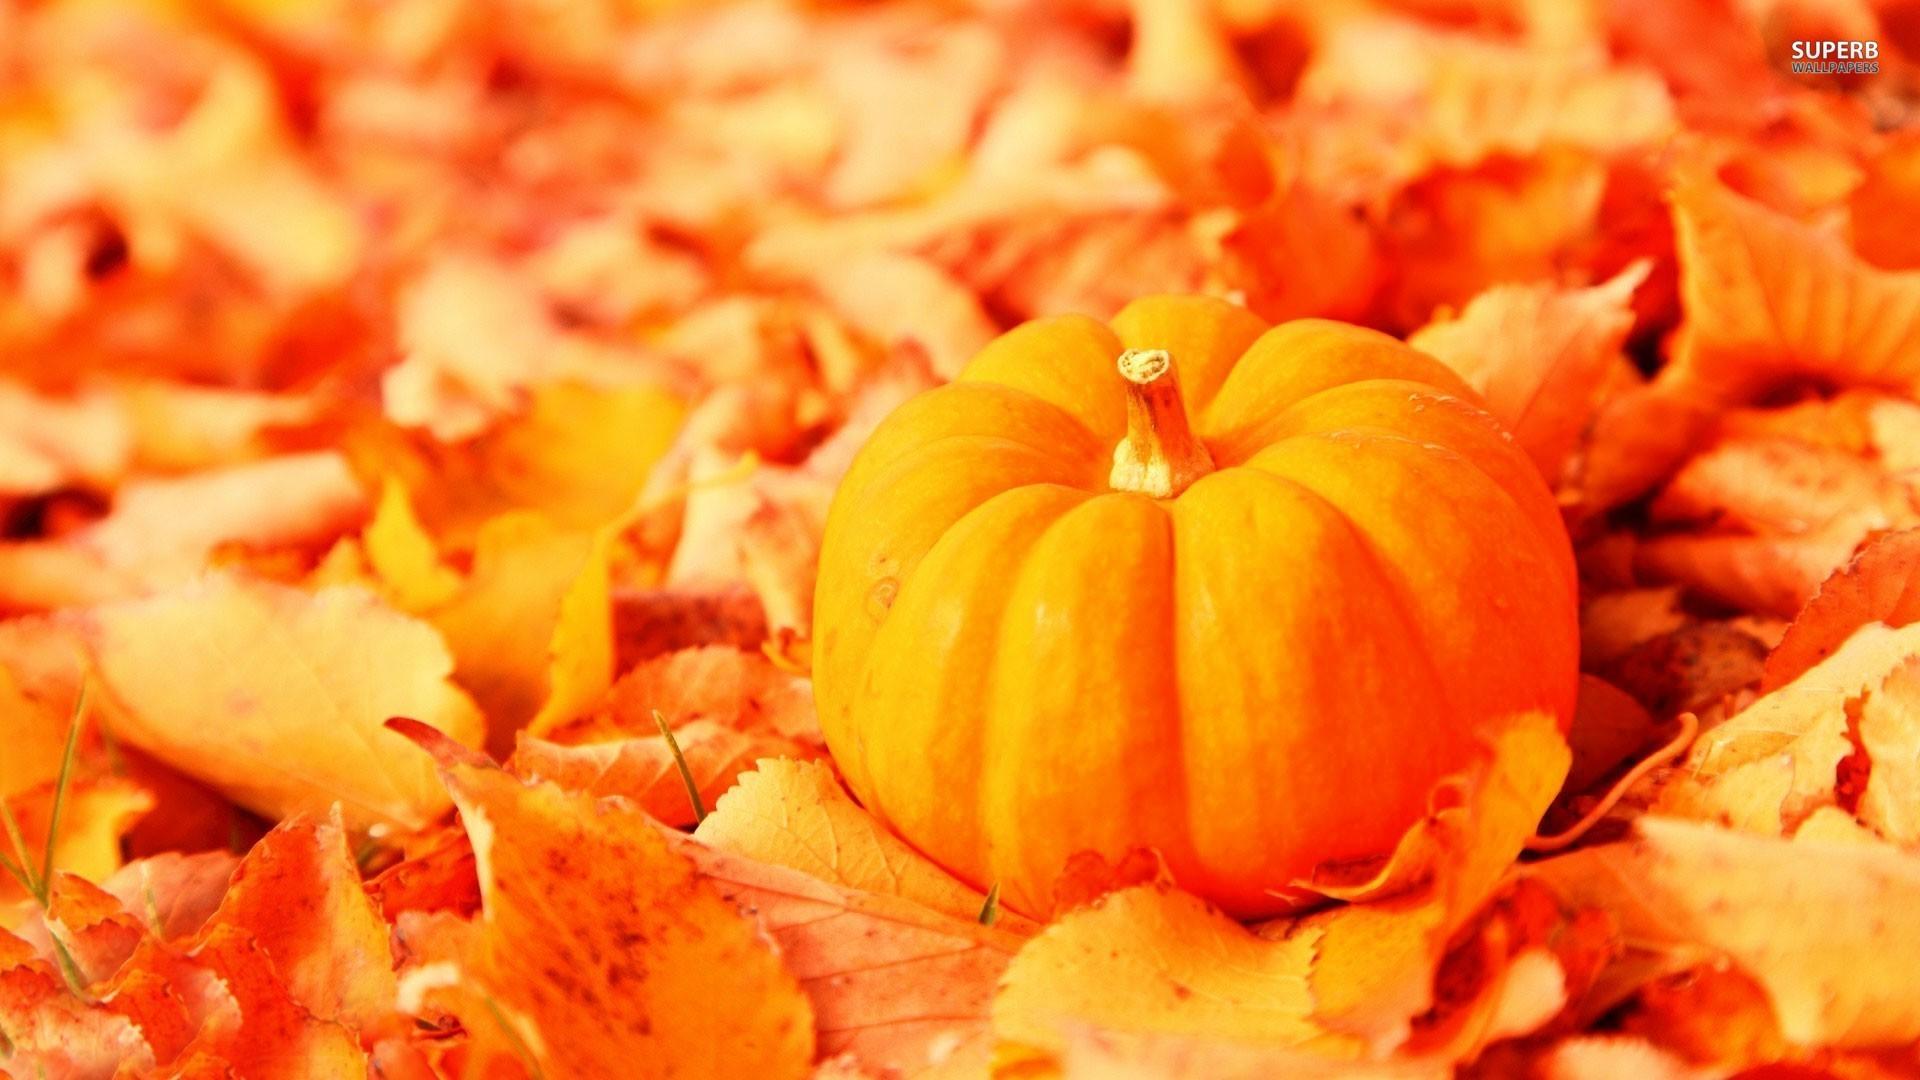 Pumpkin Wallpaper Backgrounds – Wallpaper Cave